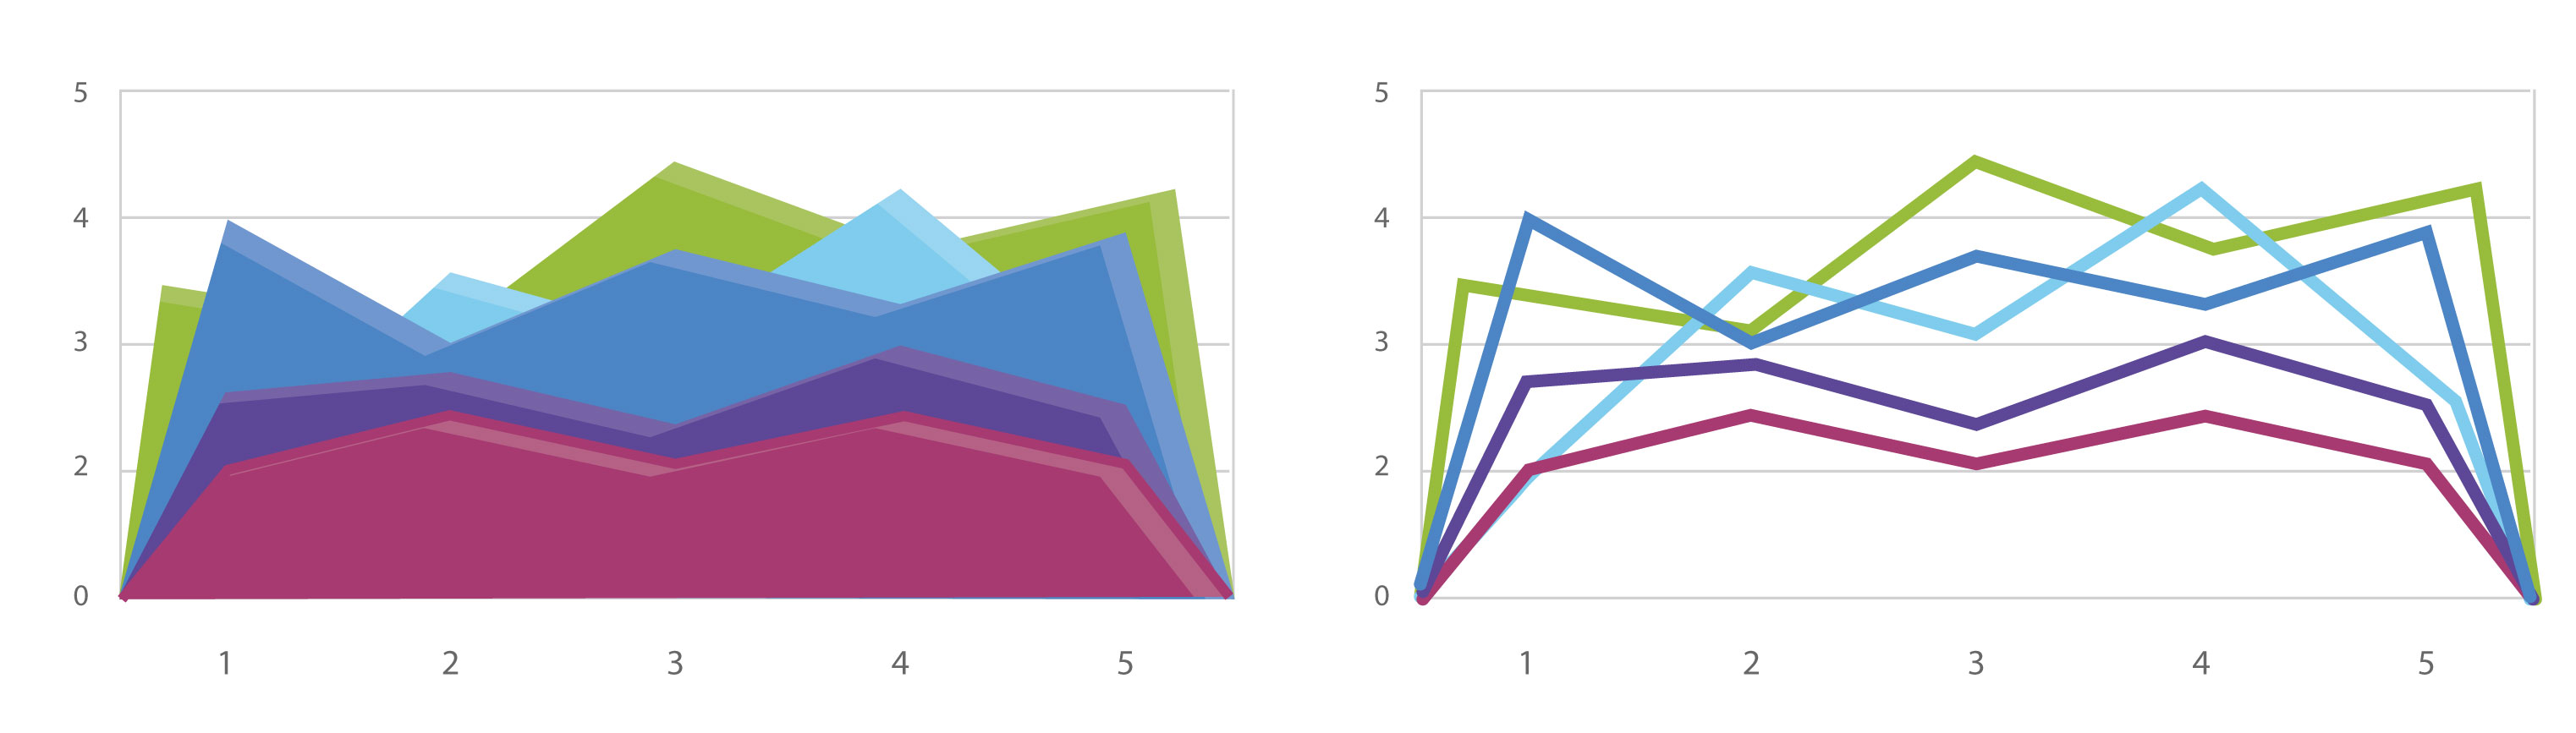 line chart area chart